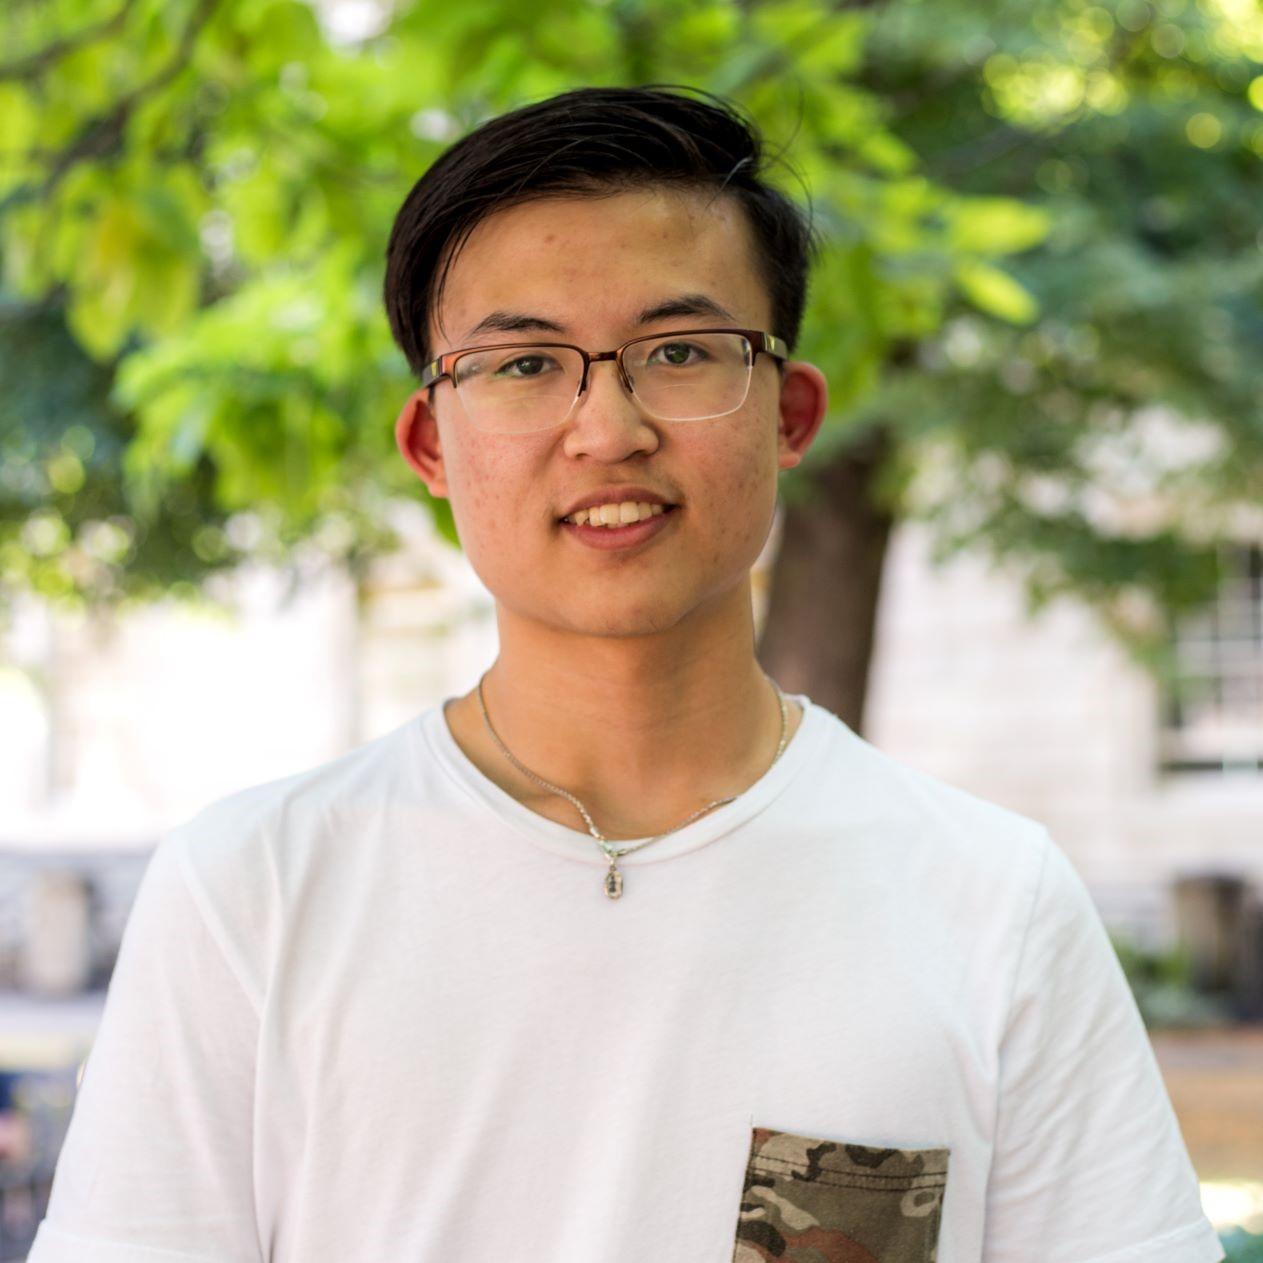 Print Yingtavornkul, former UCL Pre-university Summer School student